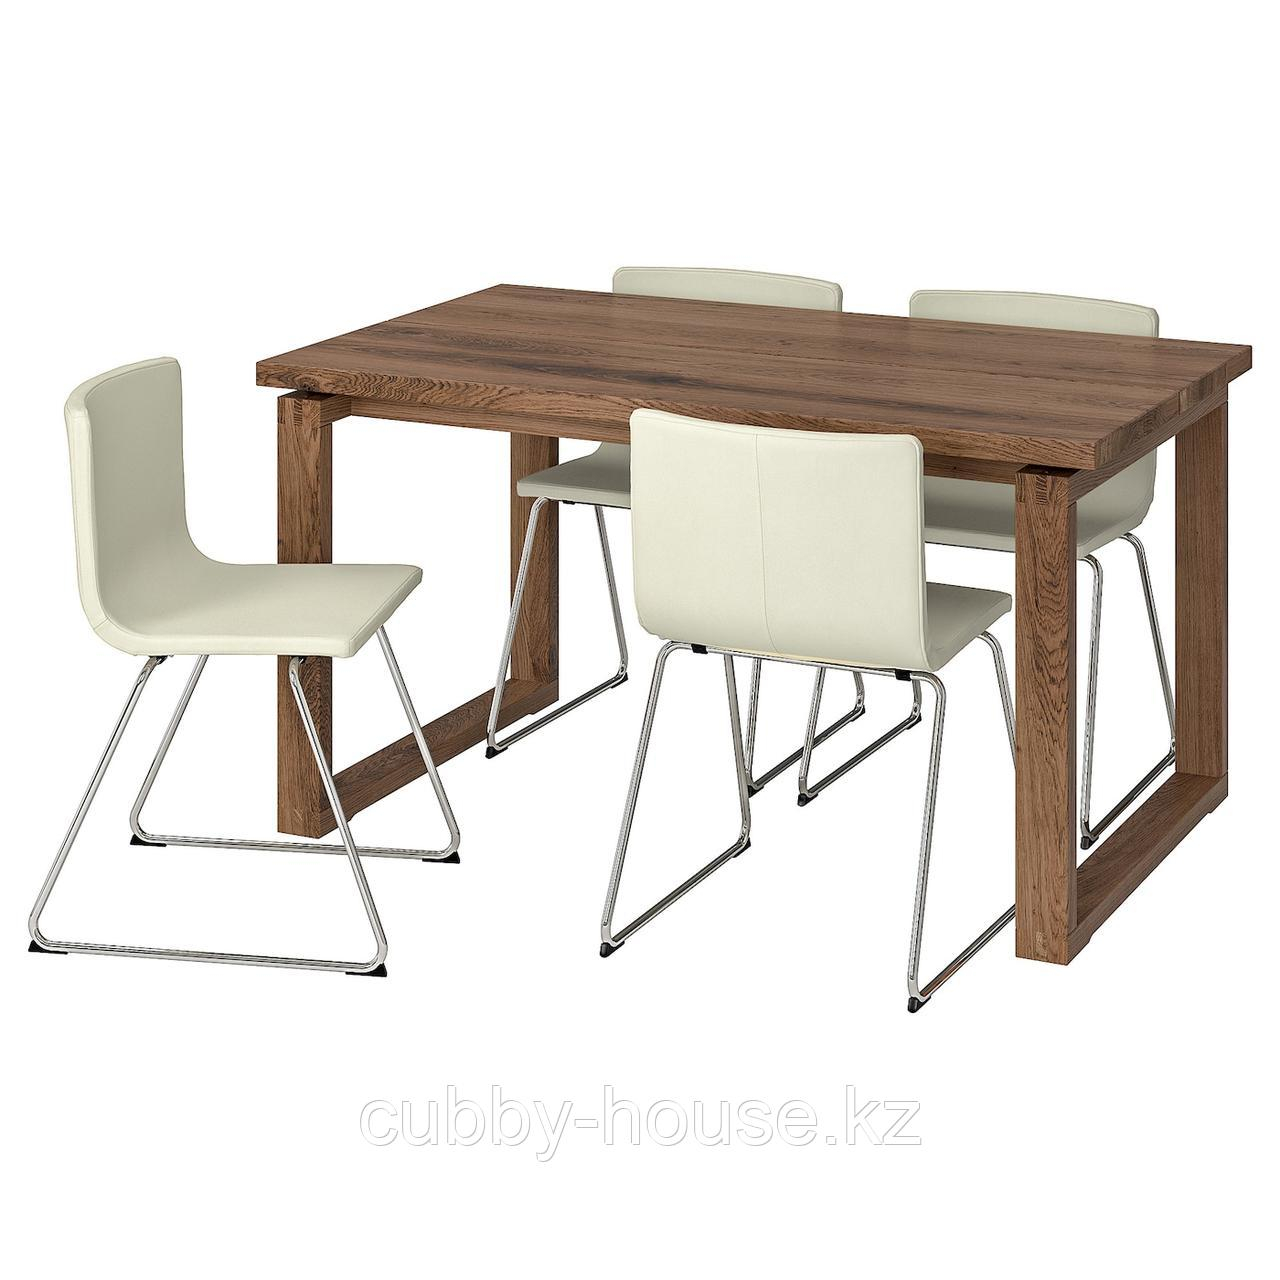 МОРБИЛОНГА / БЕРНГАРД Стол и 4 стула, коричневый, Мьюк белый, 140x85 см